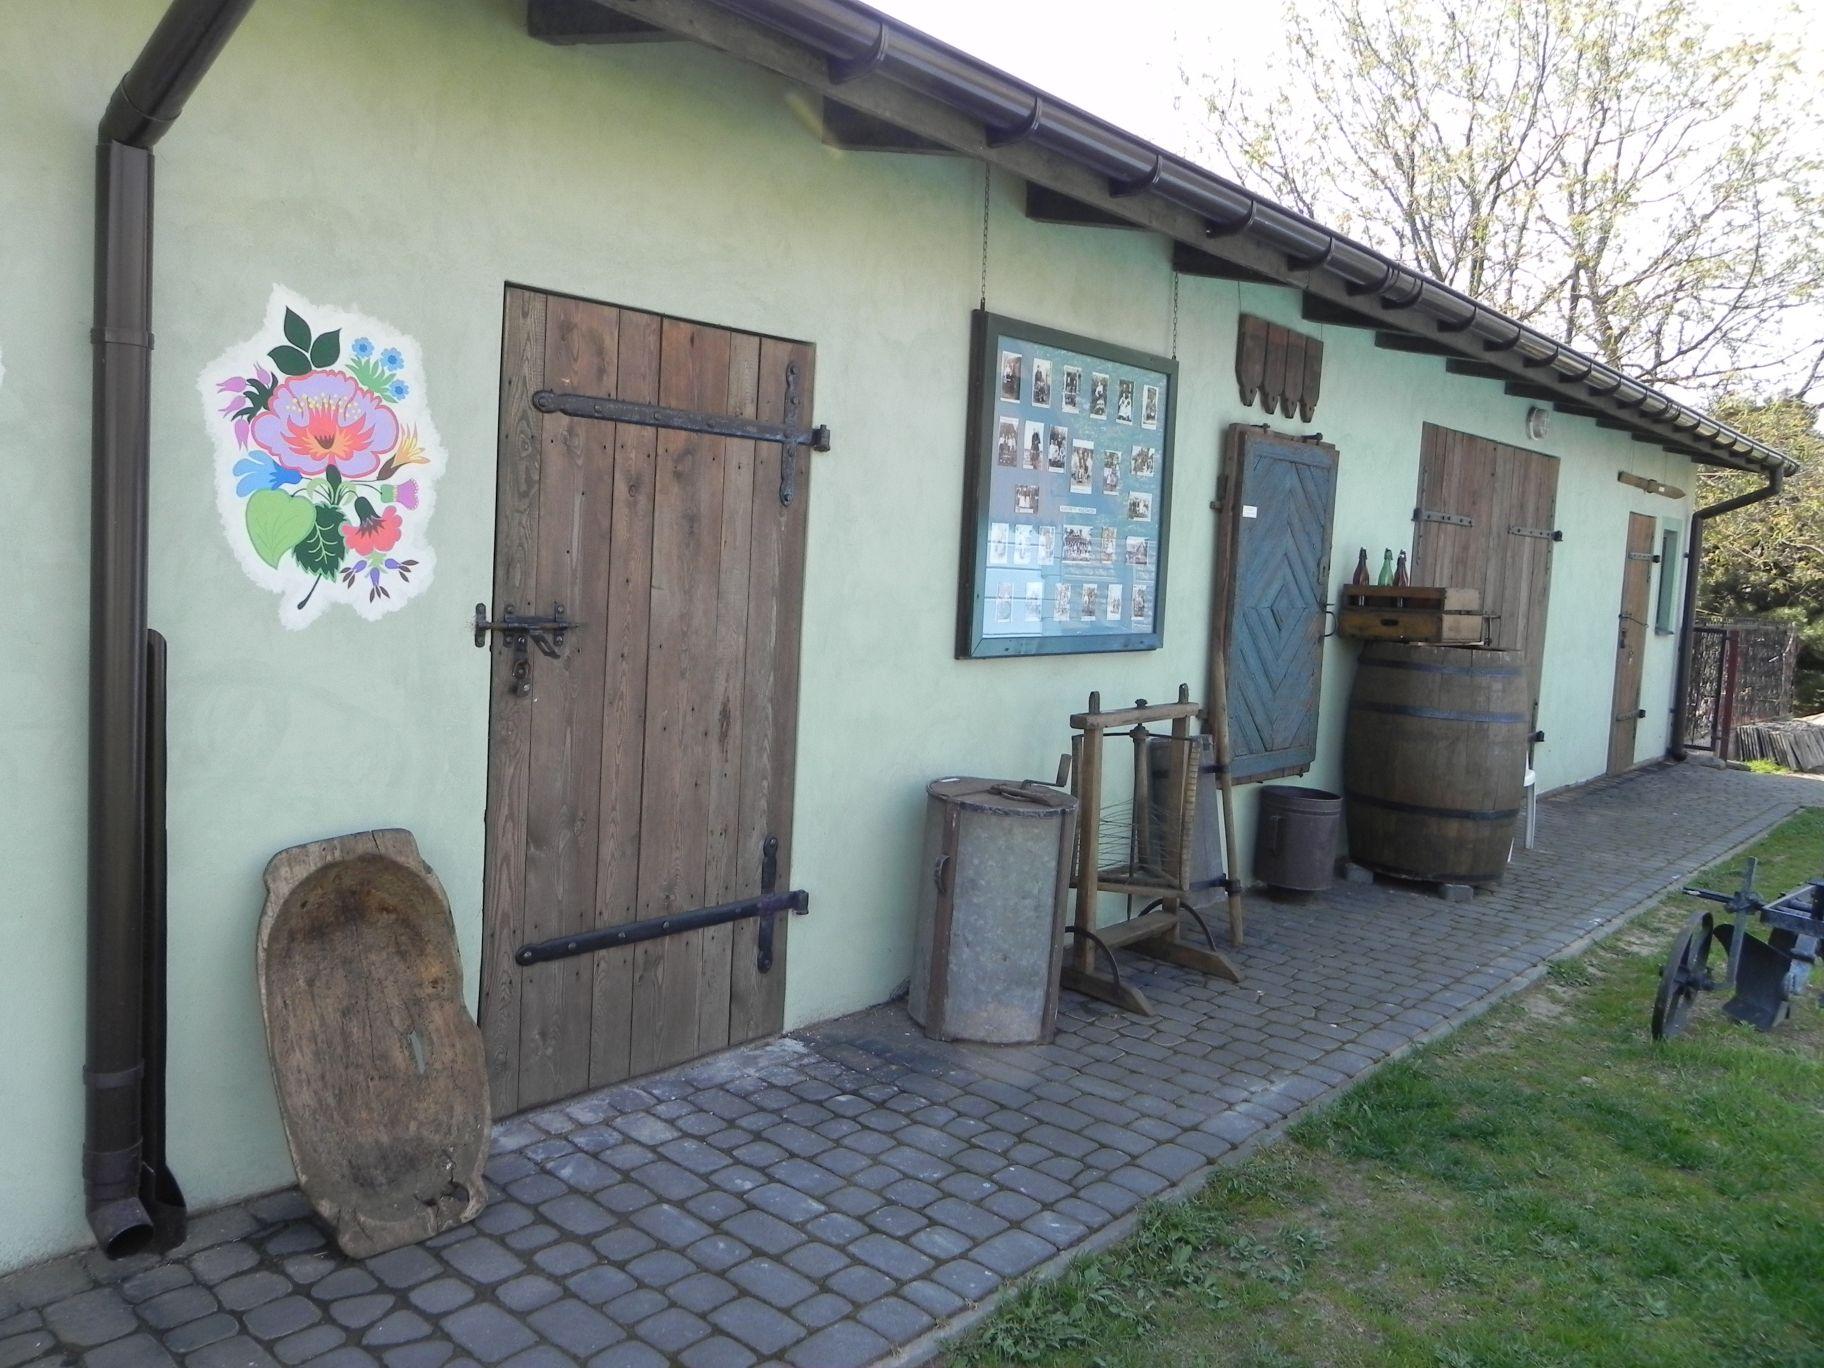 2012-05-03 Lipce Reymontowskie - galeria staroci (57)